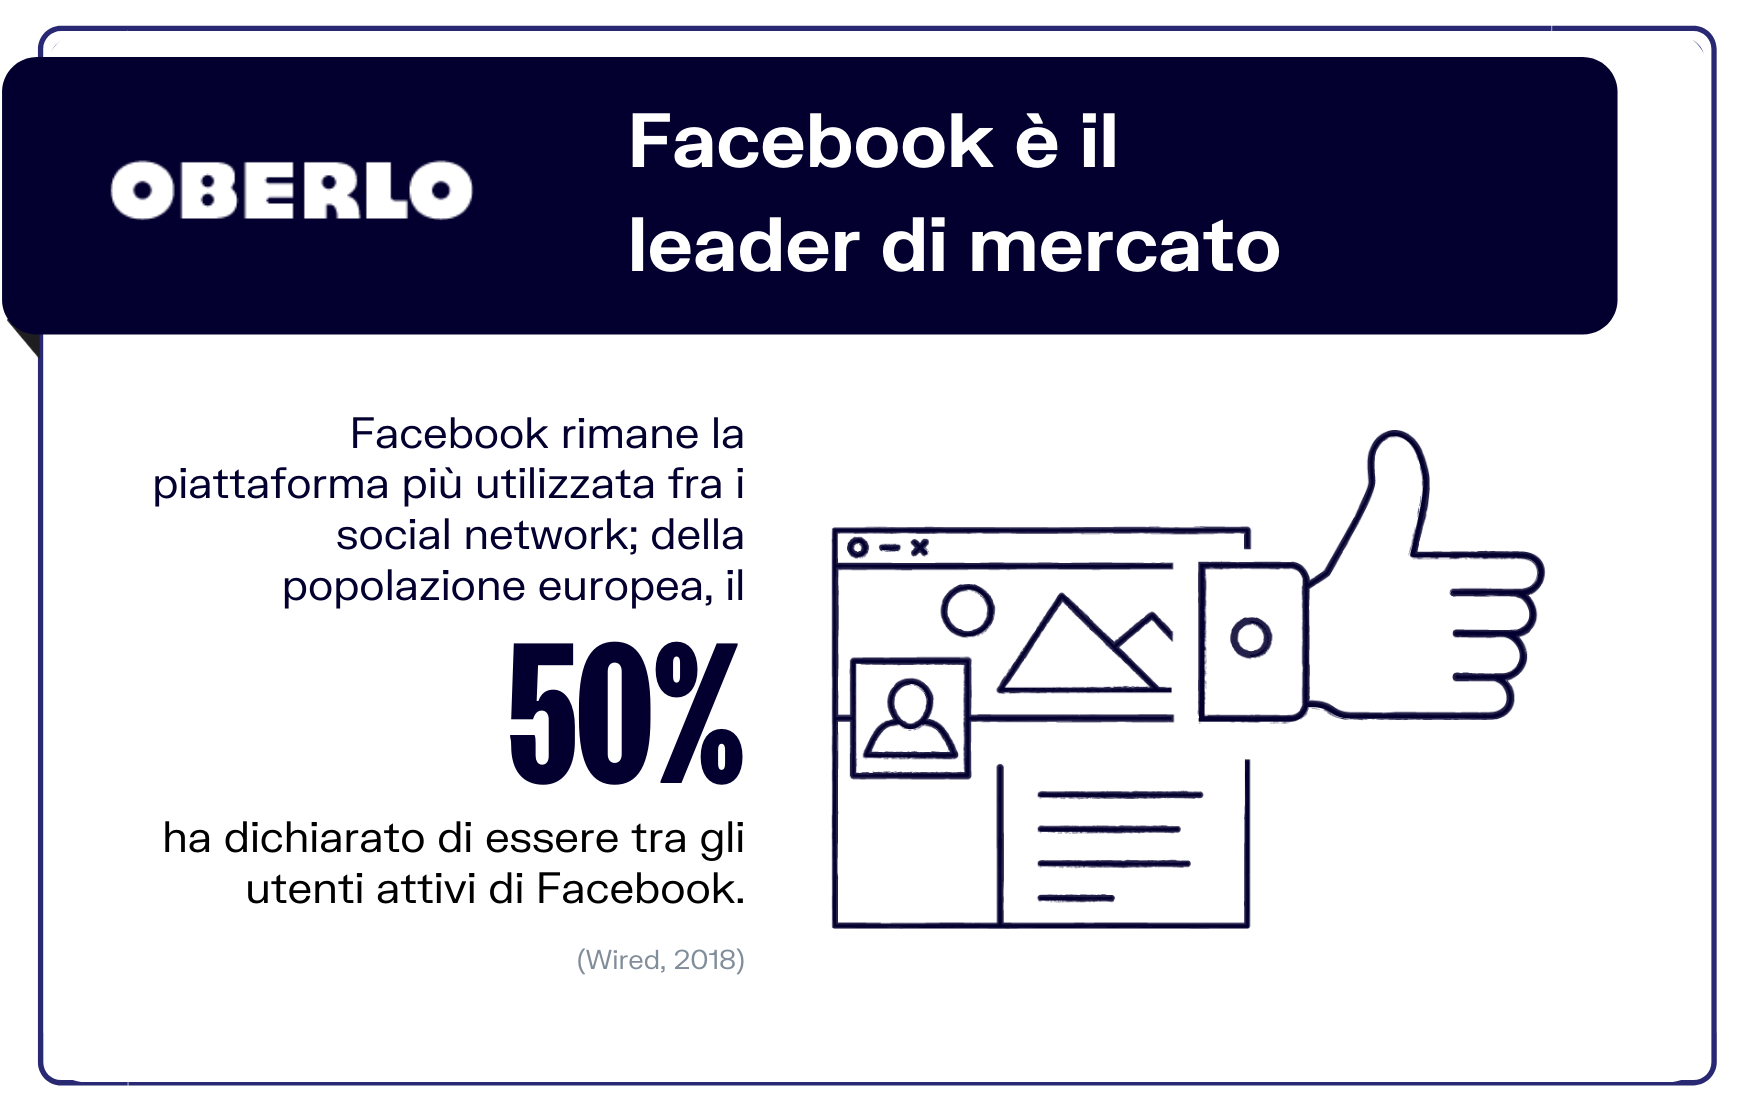 facebook leader di mercato